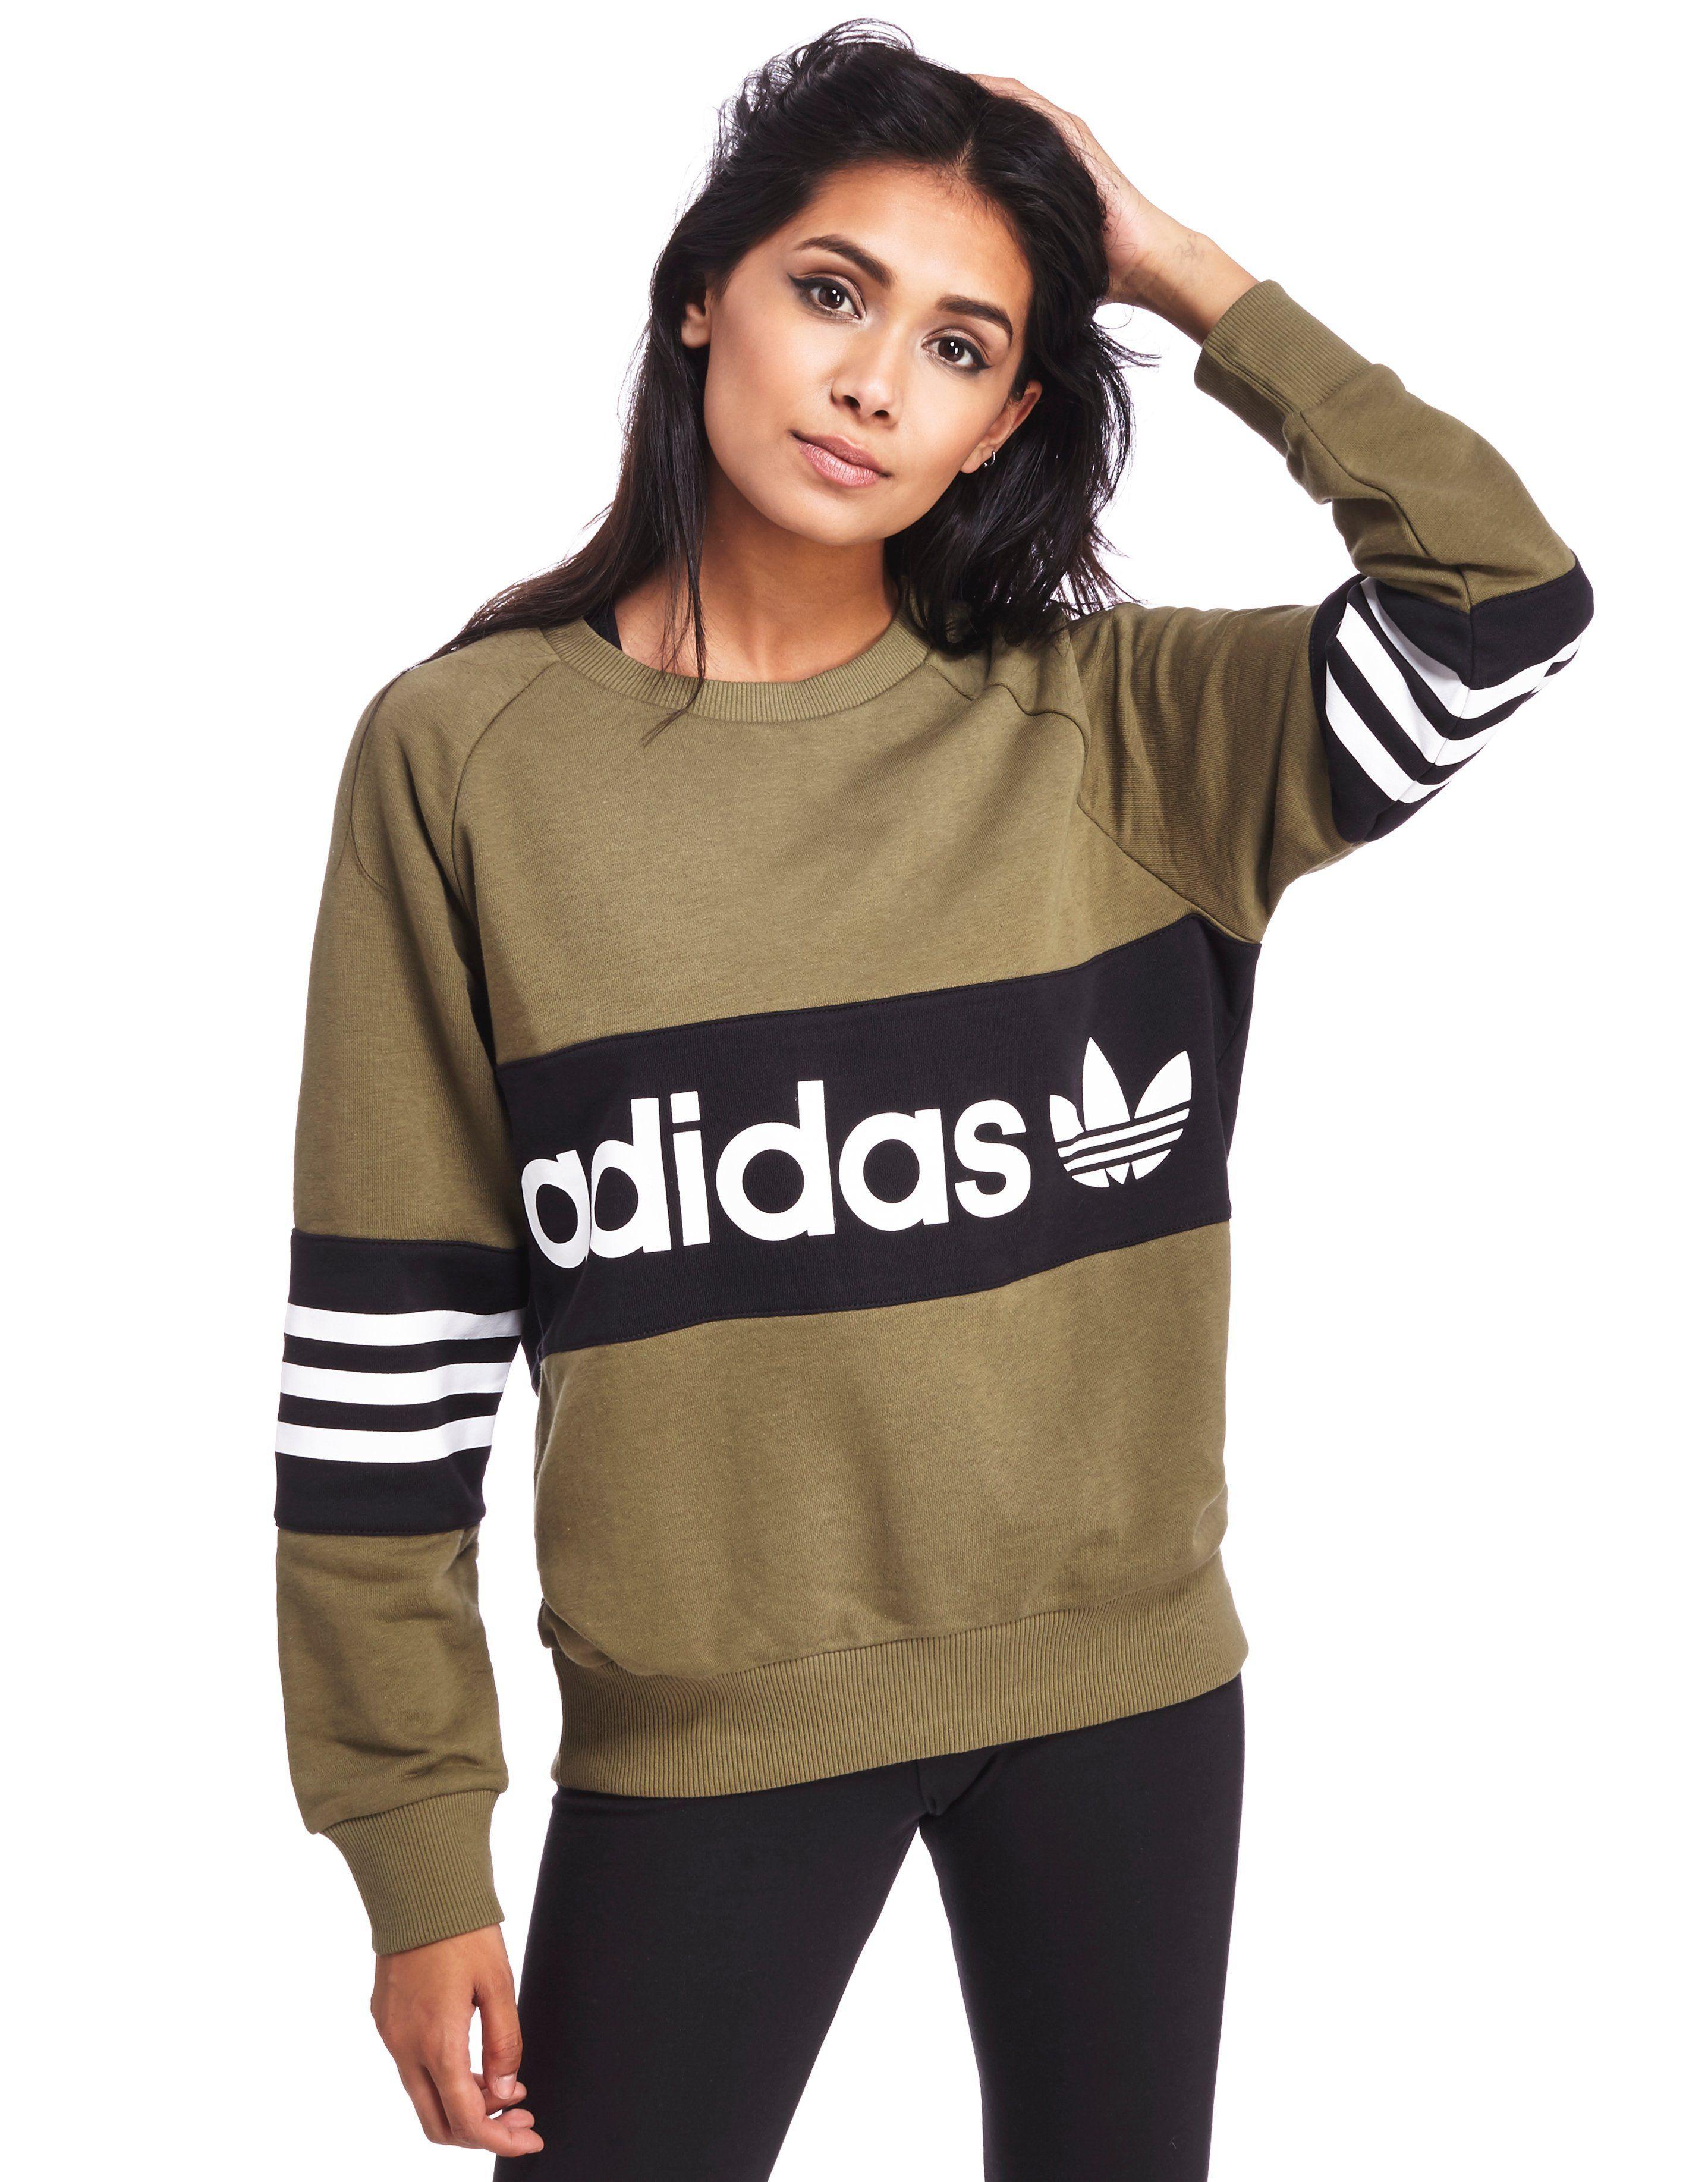 db67ce54da adidas Originals Street Crew Sweatshirt - Shop online for adidas Originals  Street Crew Sweatshirt with JD Sports